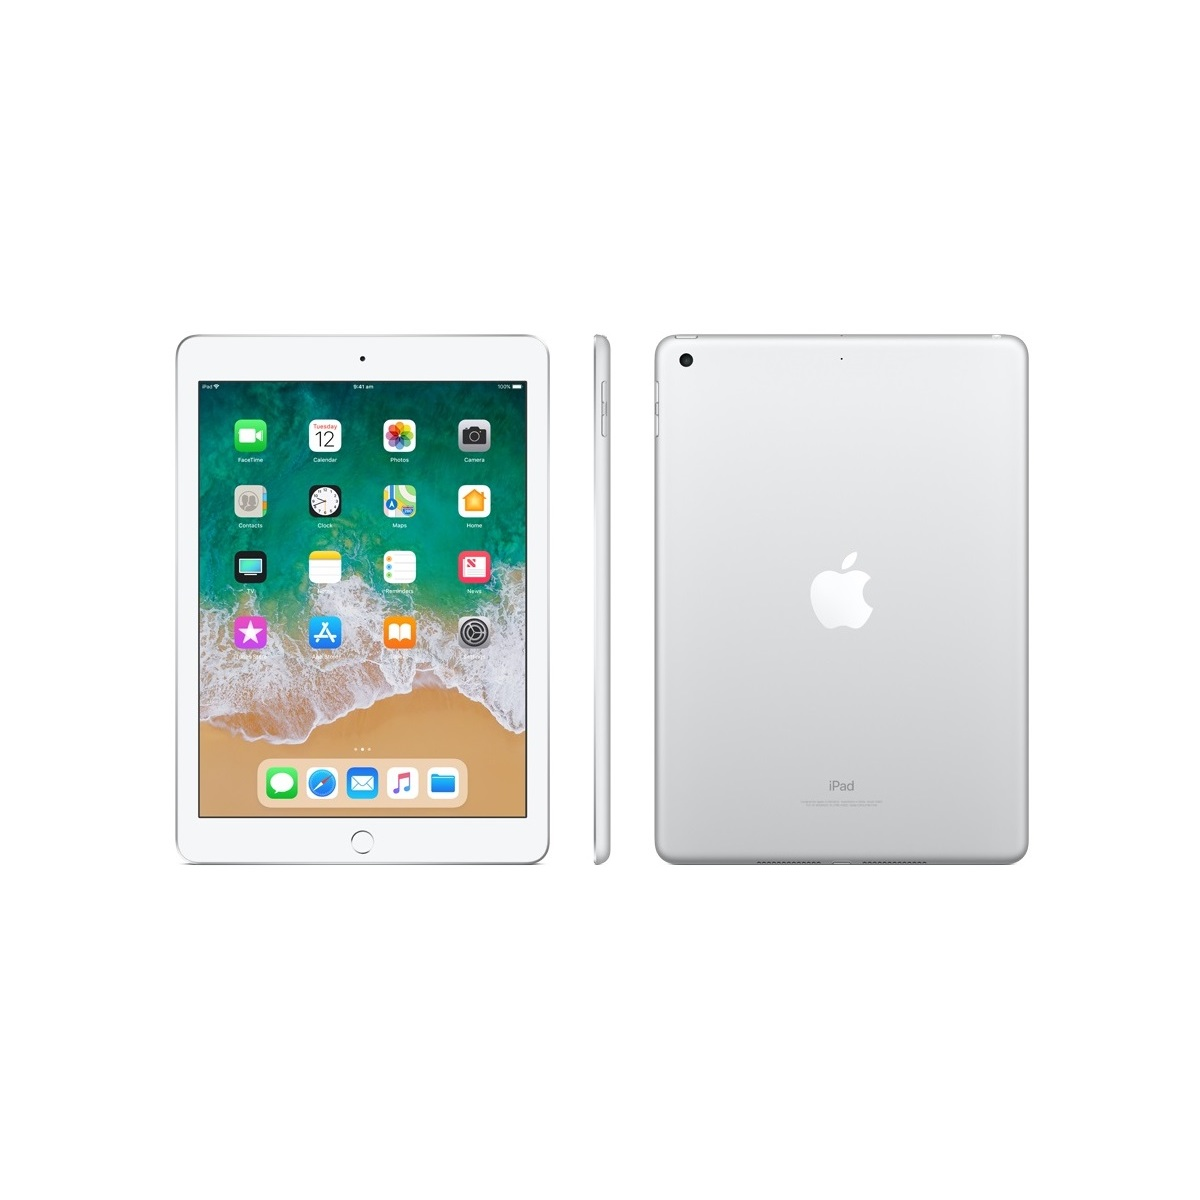 Apple, iPad, 9.7, 32GB, Silver, 4GX, Tablet, G6,